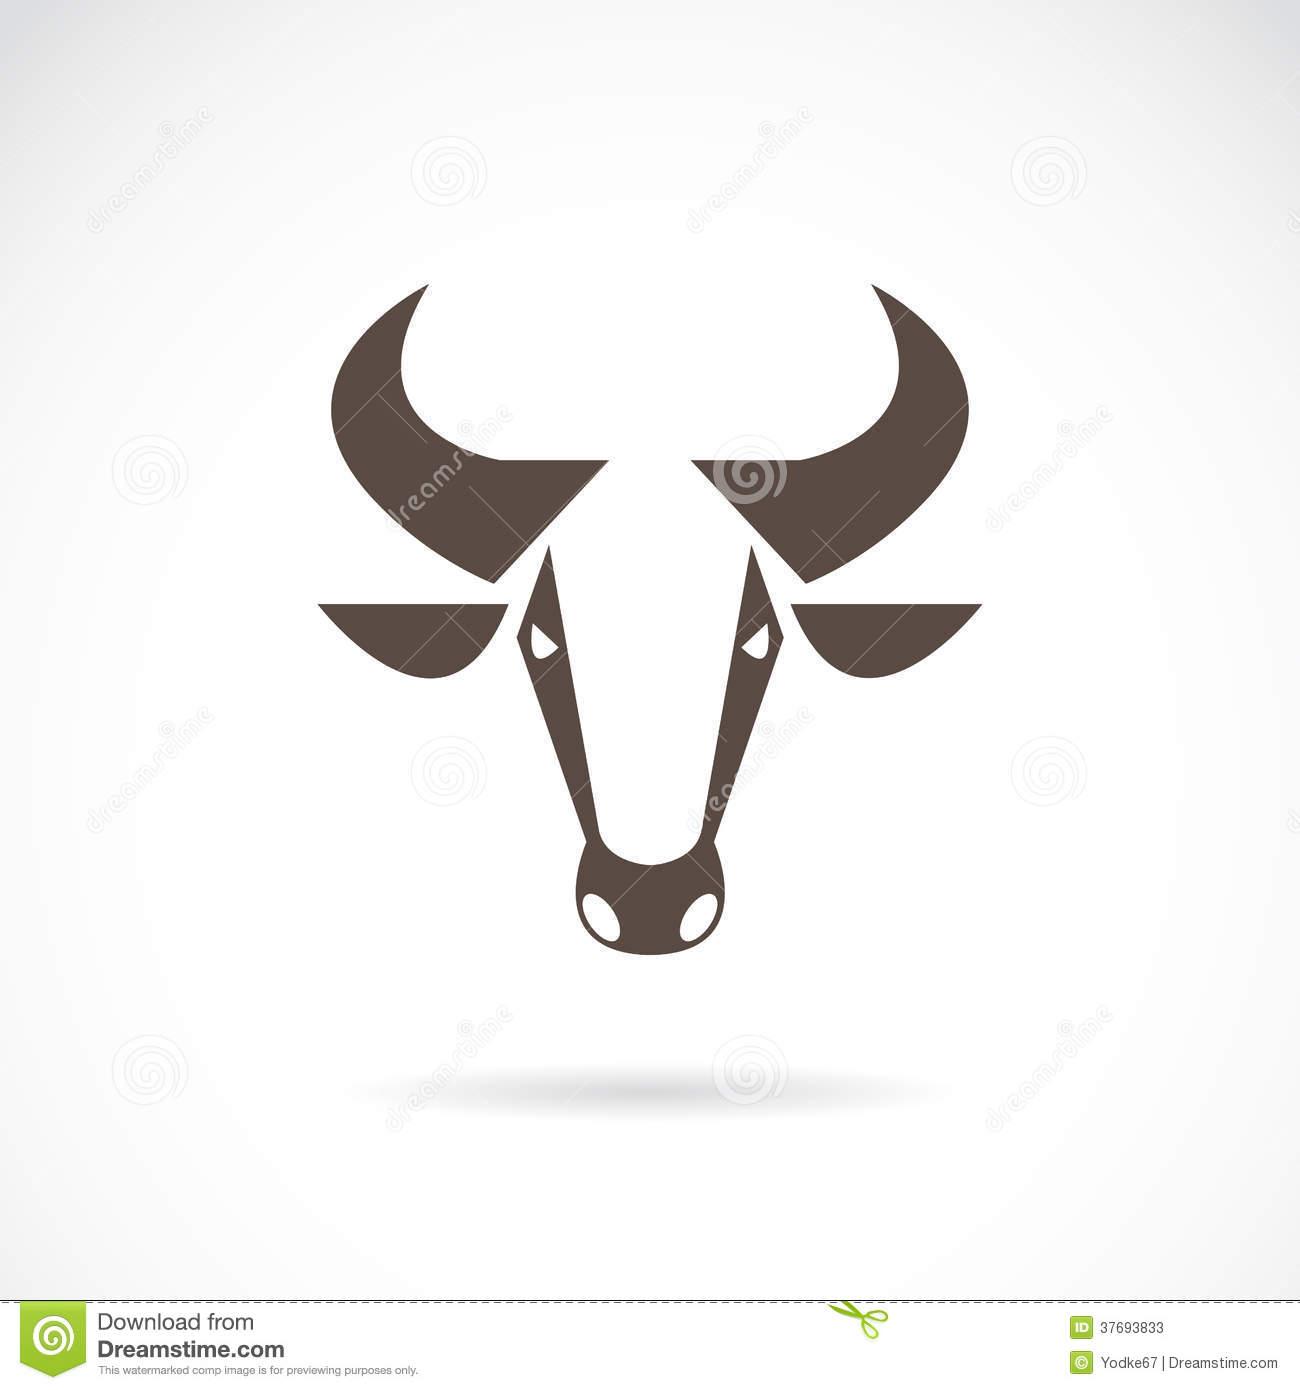 19 Cow Skull Vector Images - Cow Skull Vector Art, Bull ...